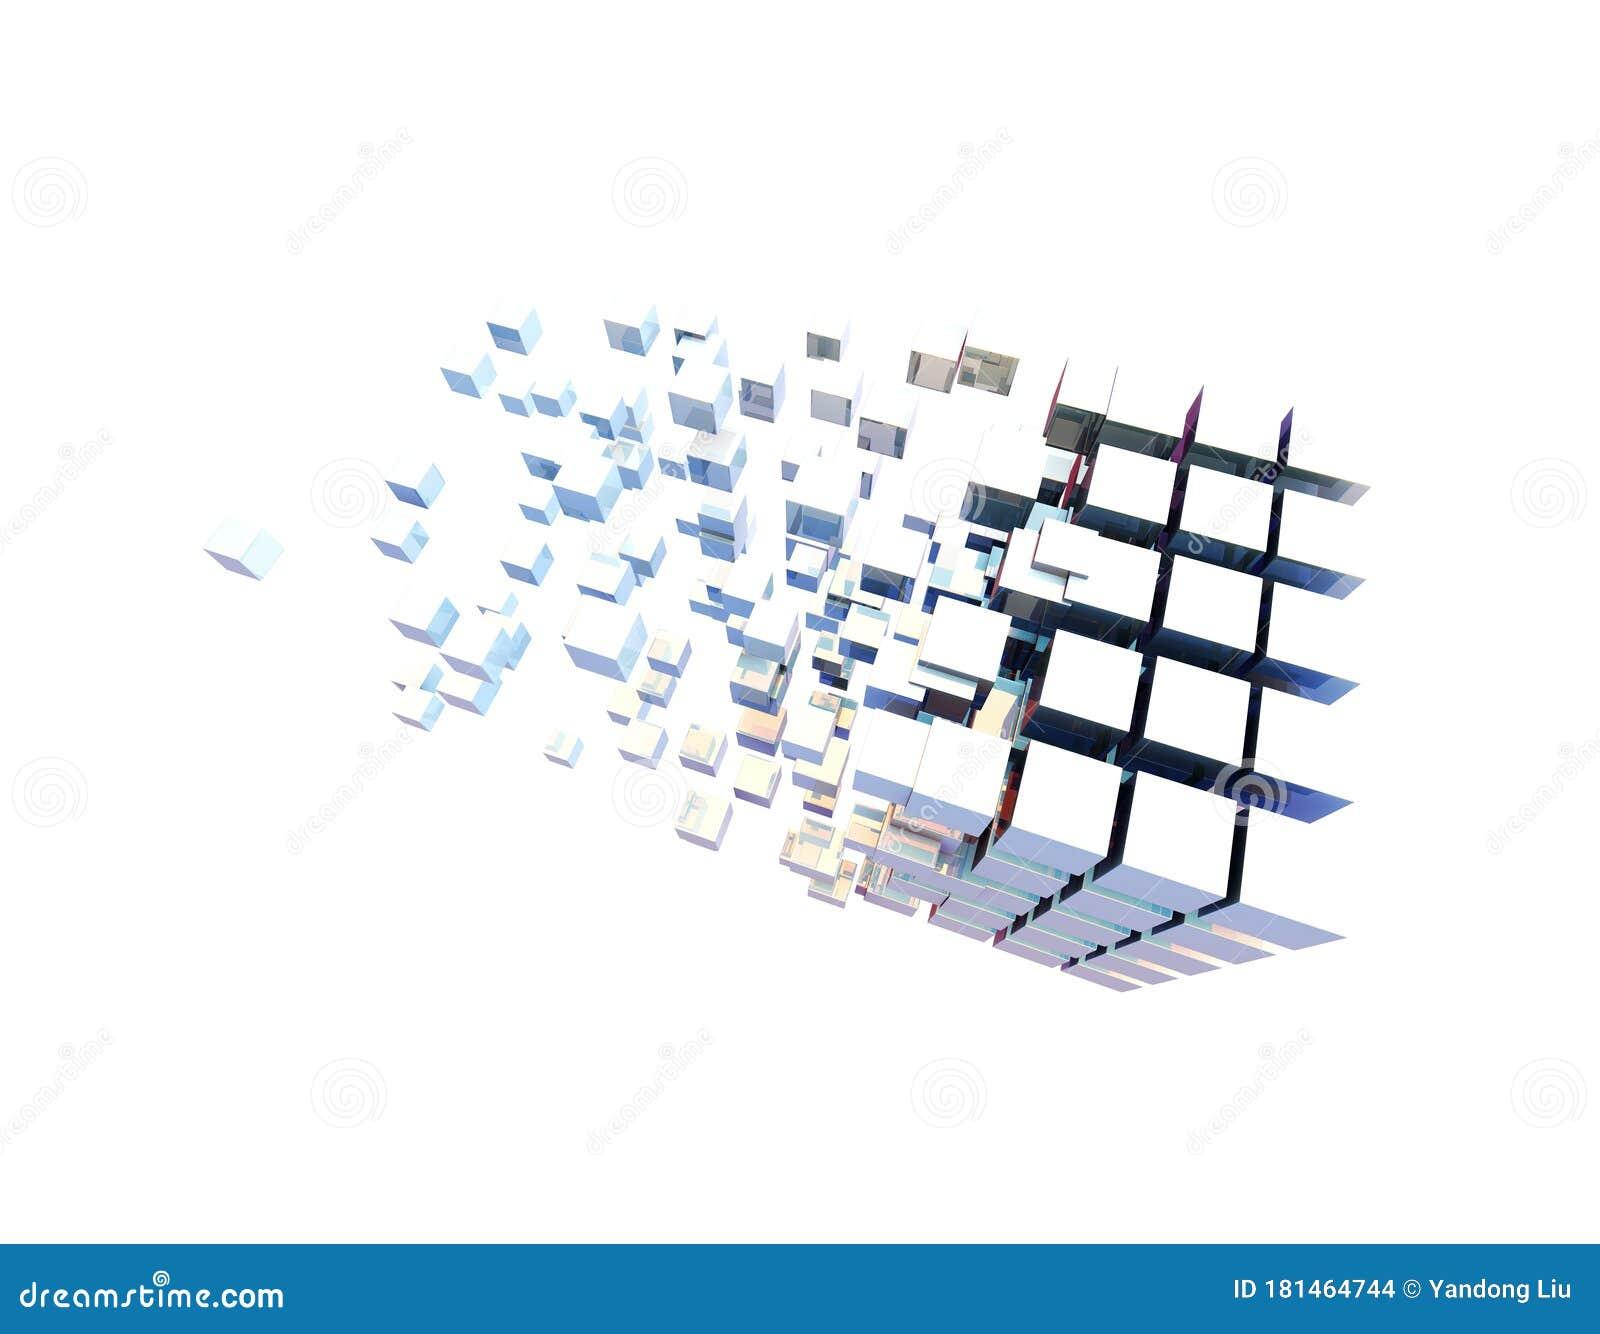 Cube Digital Technology And Programming Data Transmission And Storage Intelligent Programs Stock Illustration Illustration Of Clone Digitization 181464744